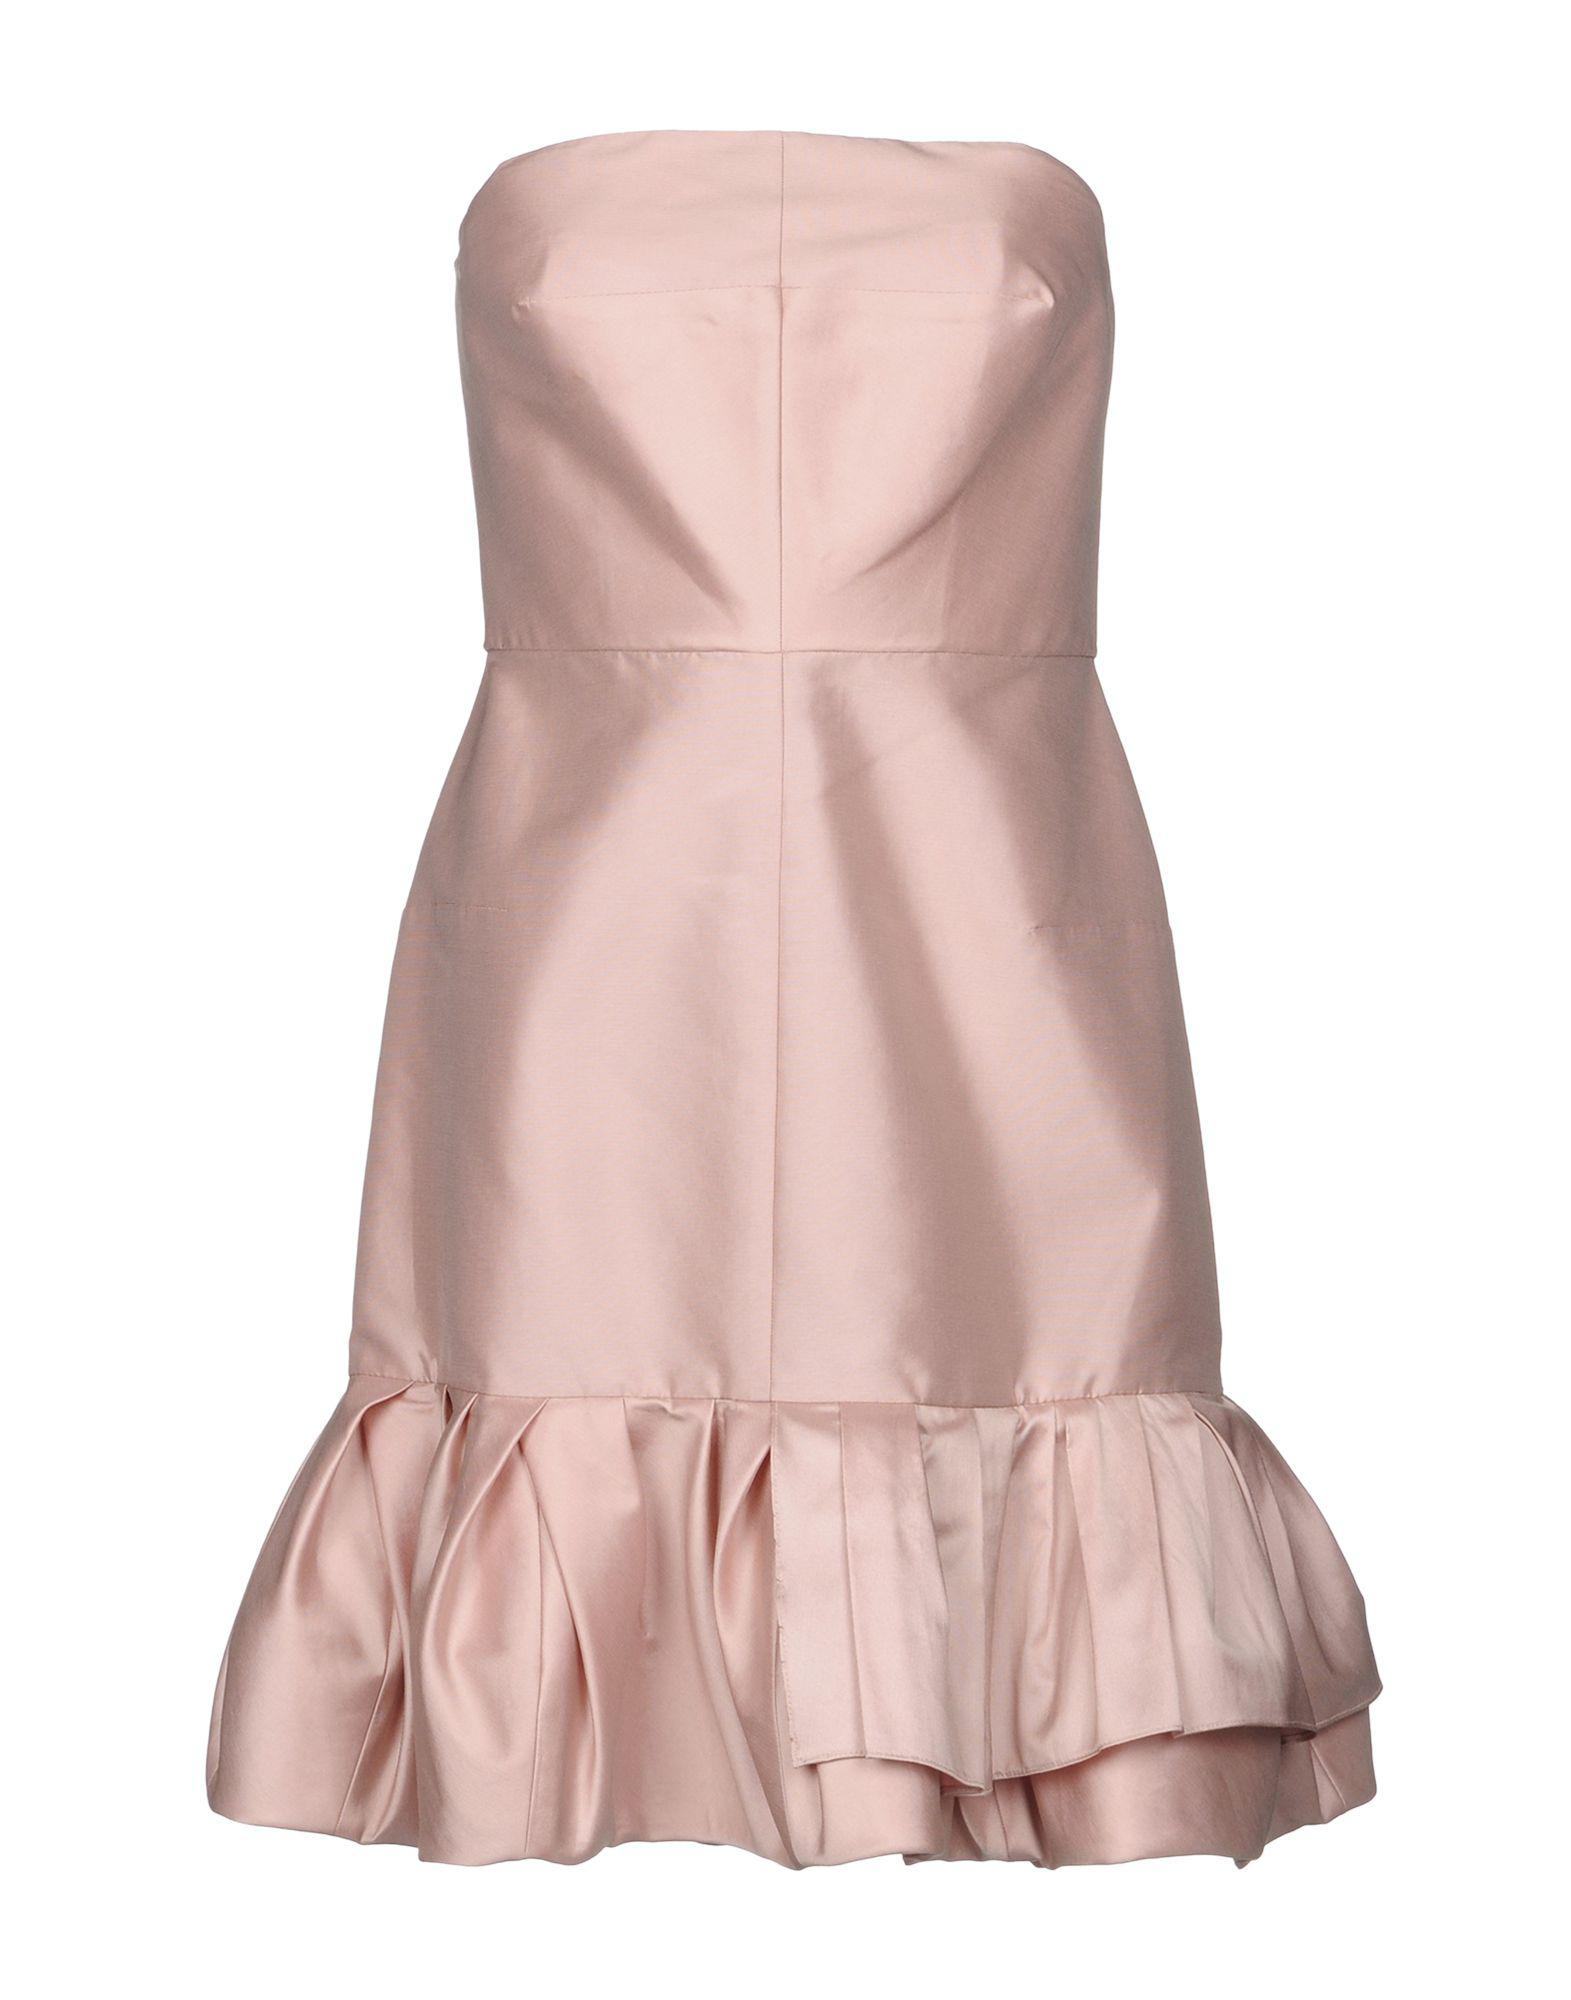 DRESSES - Short dresses Dice Kayek Finishline Cheap Online A3b7P3c